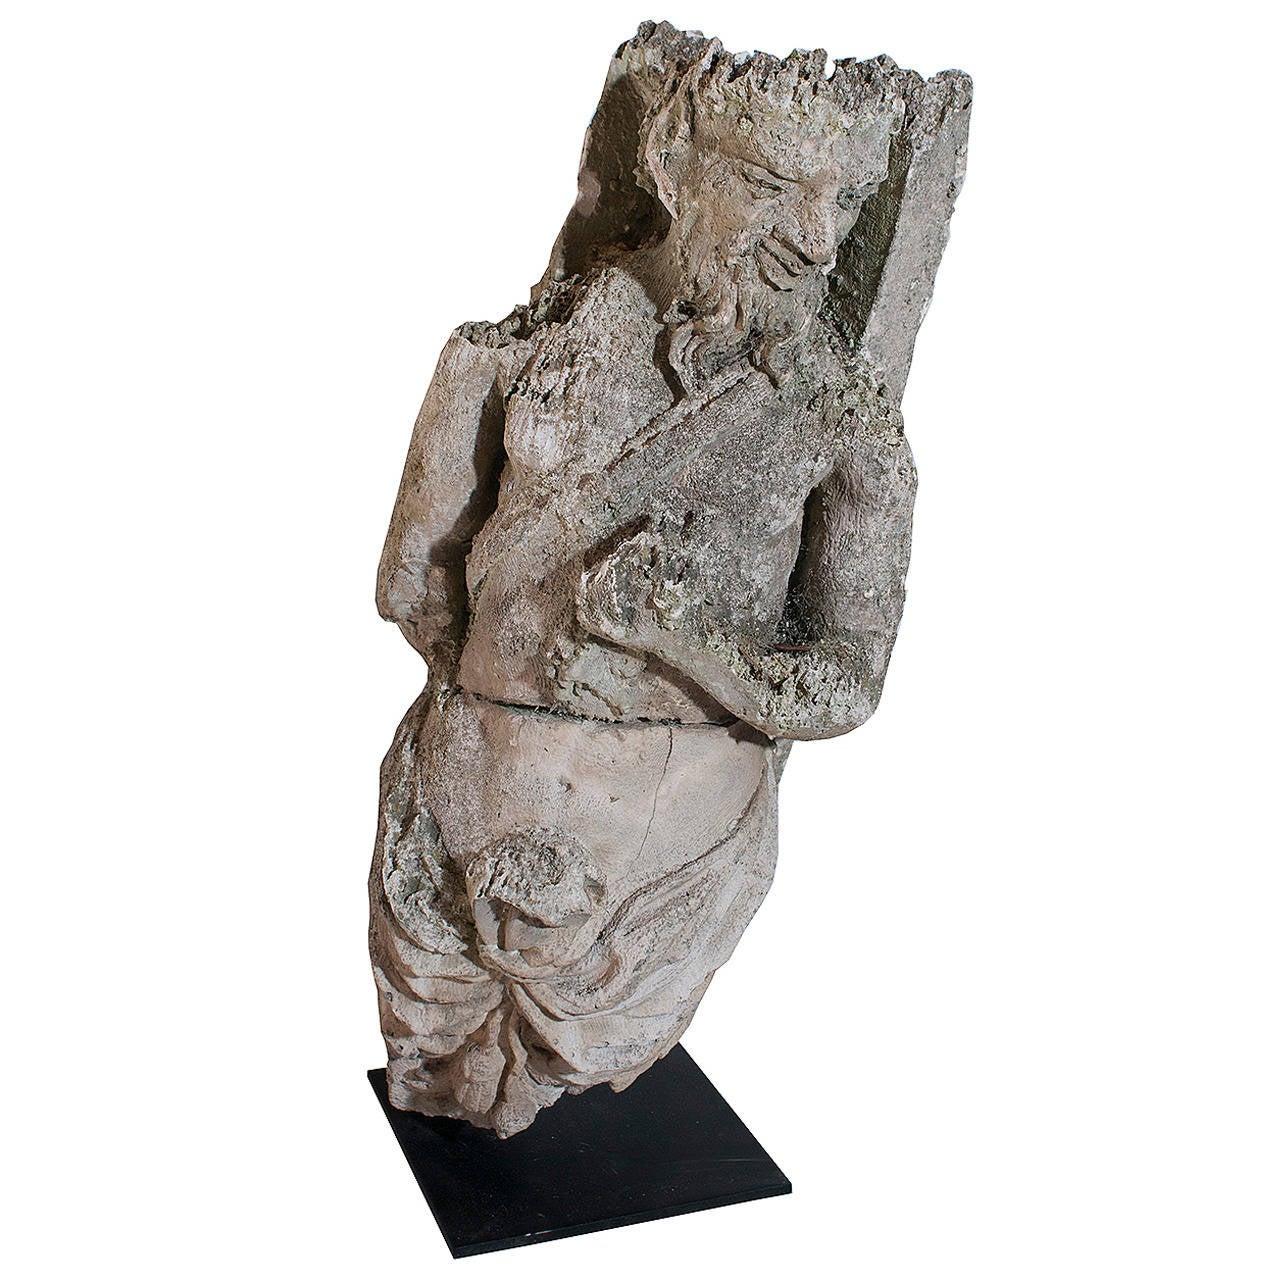 Limestone Sculpture of a Faun